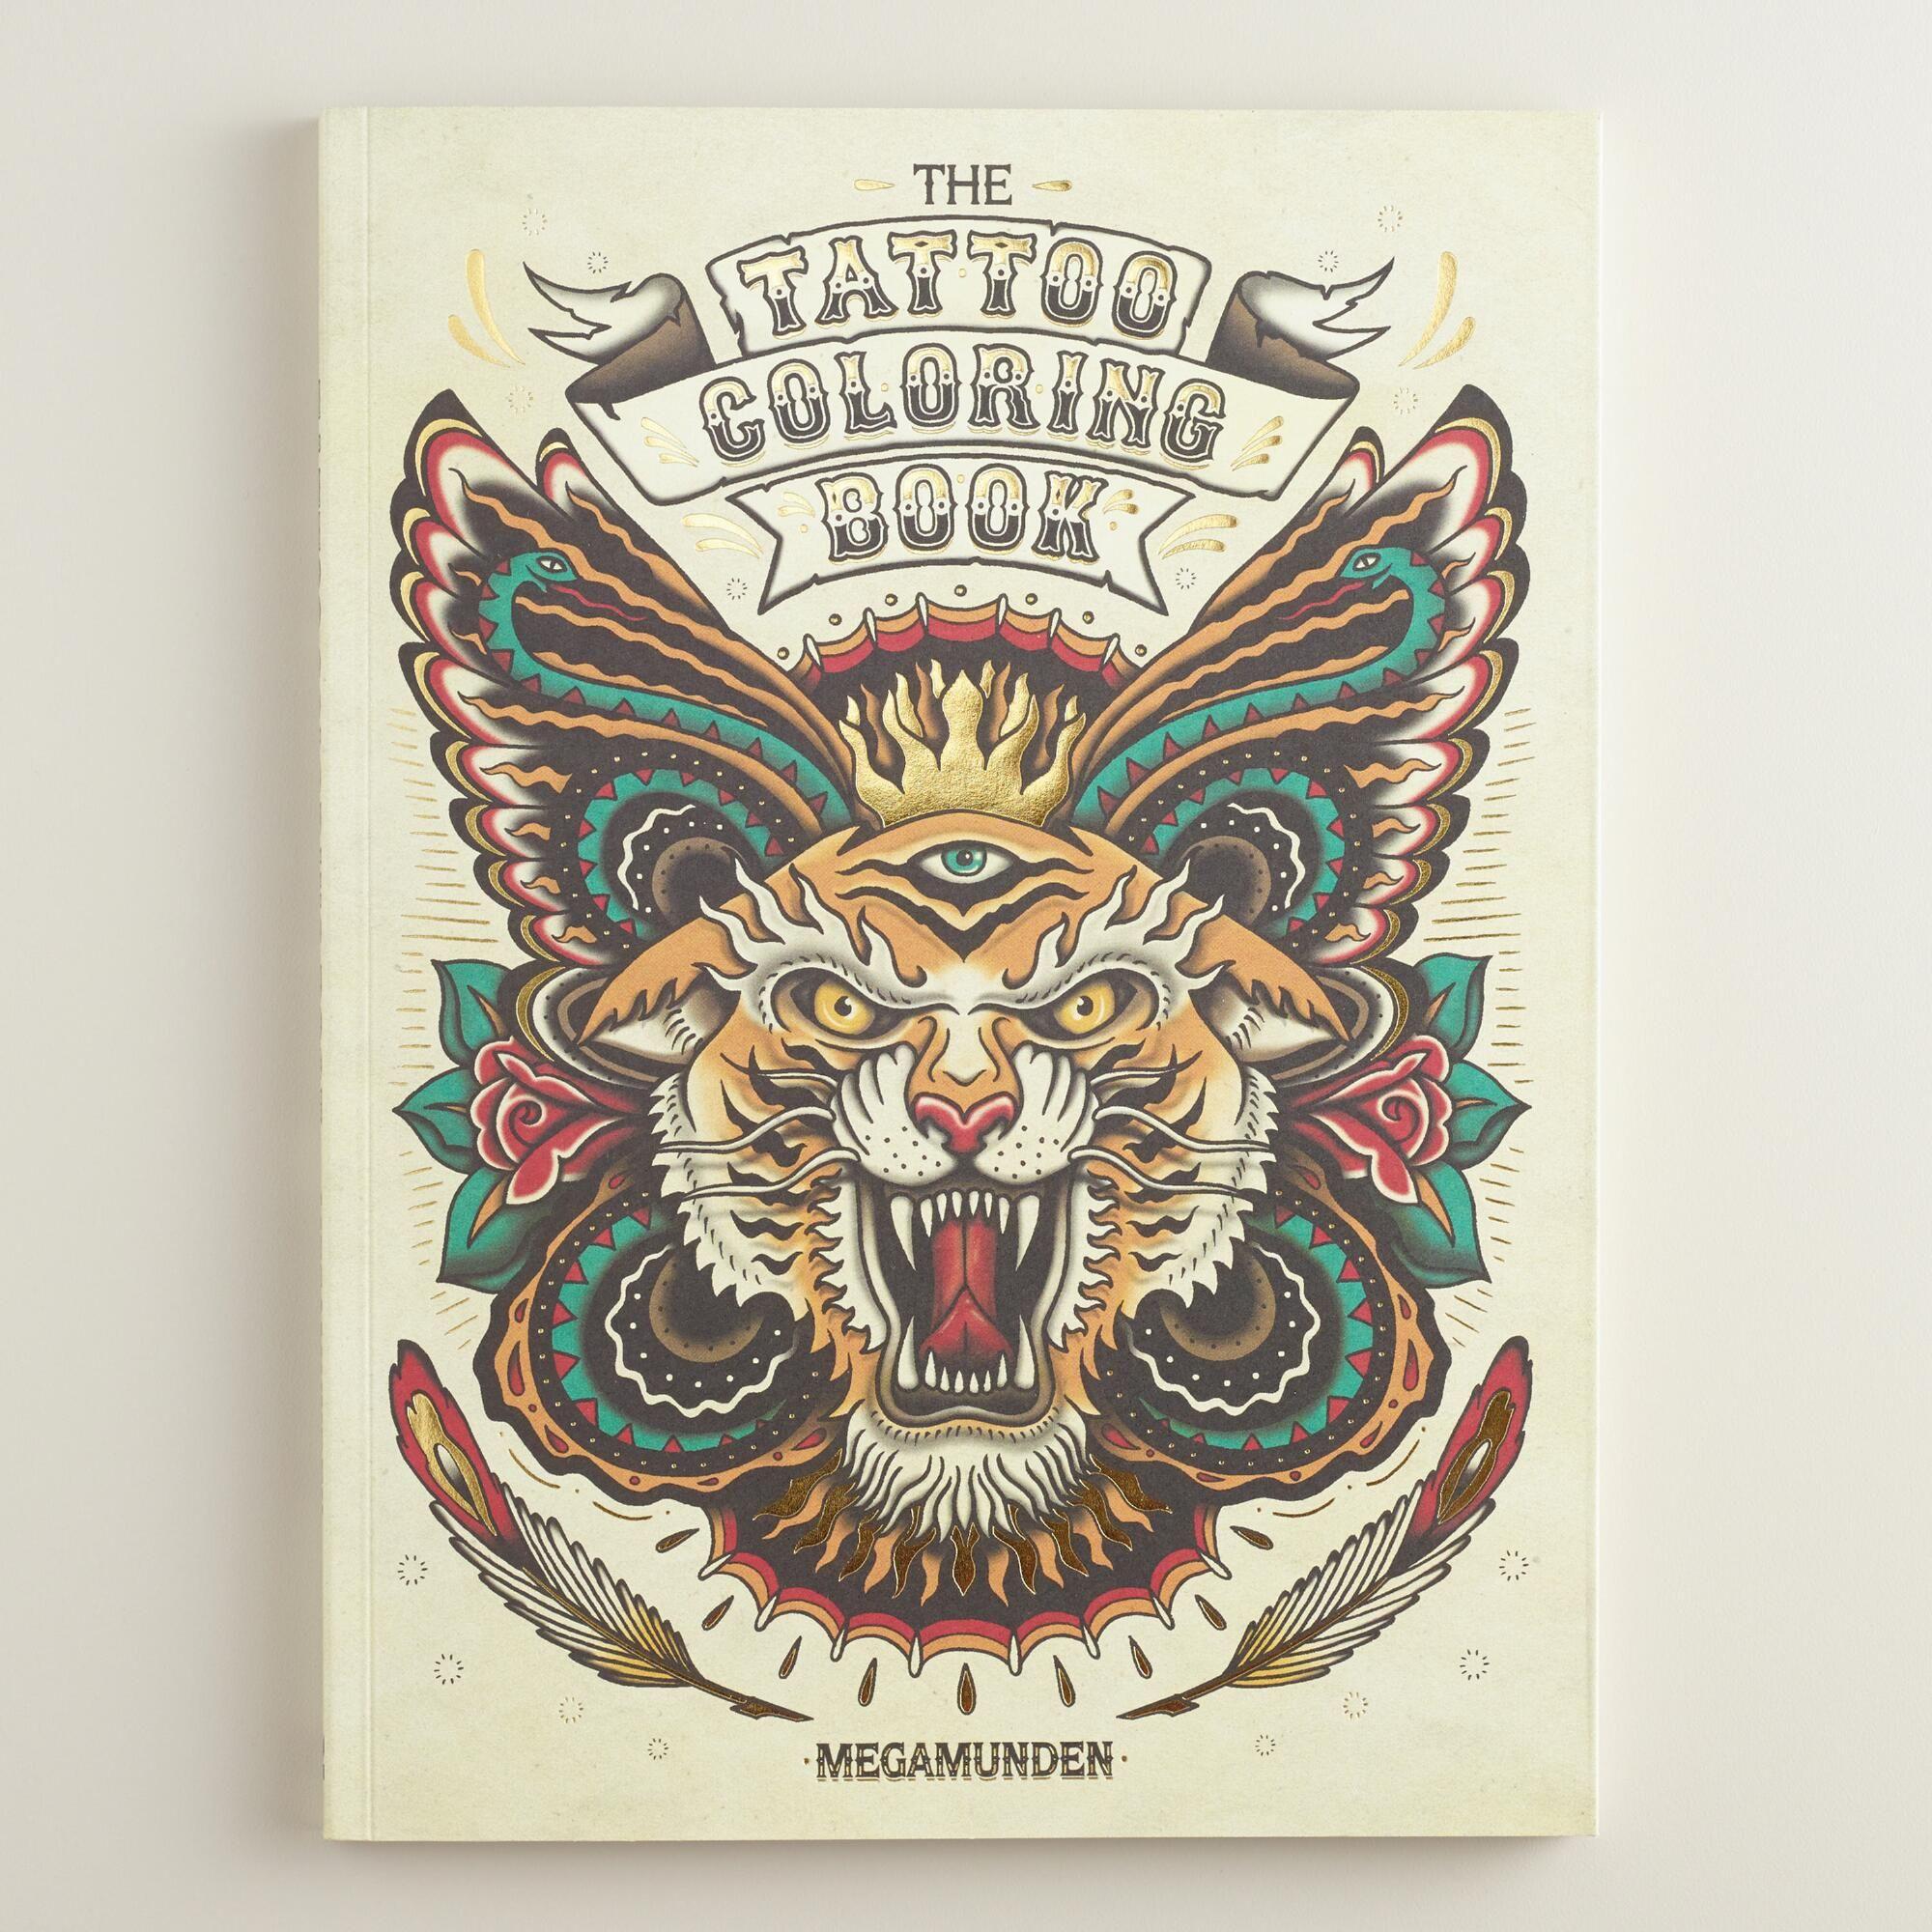 The Tattoo Coloring Book Tattoo Coloring Book Book Tattoo Coloring Books